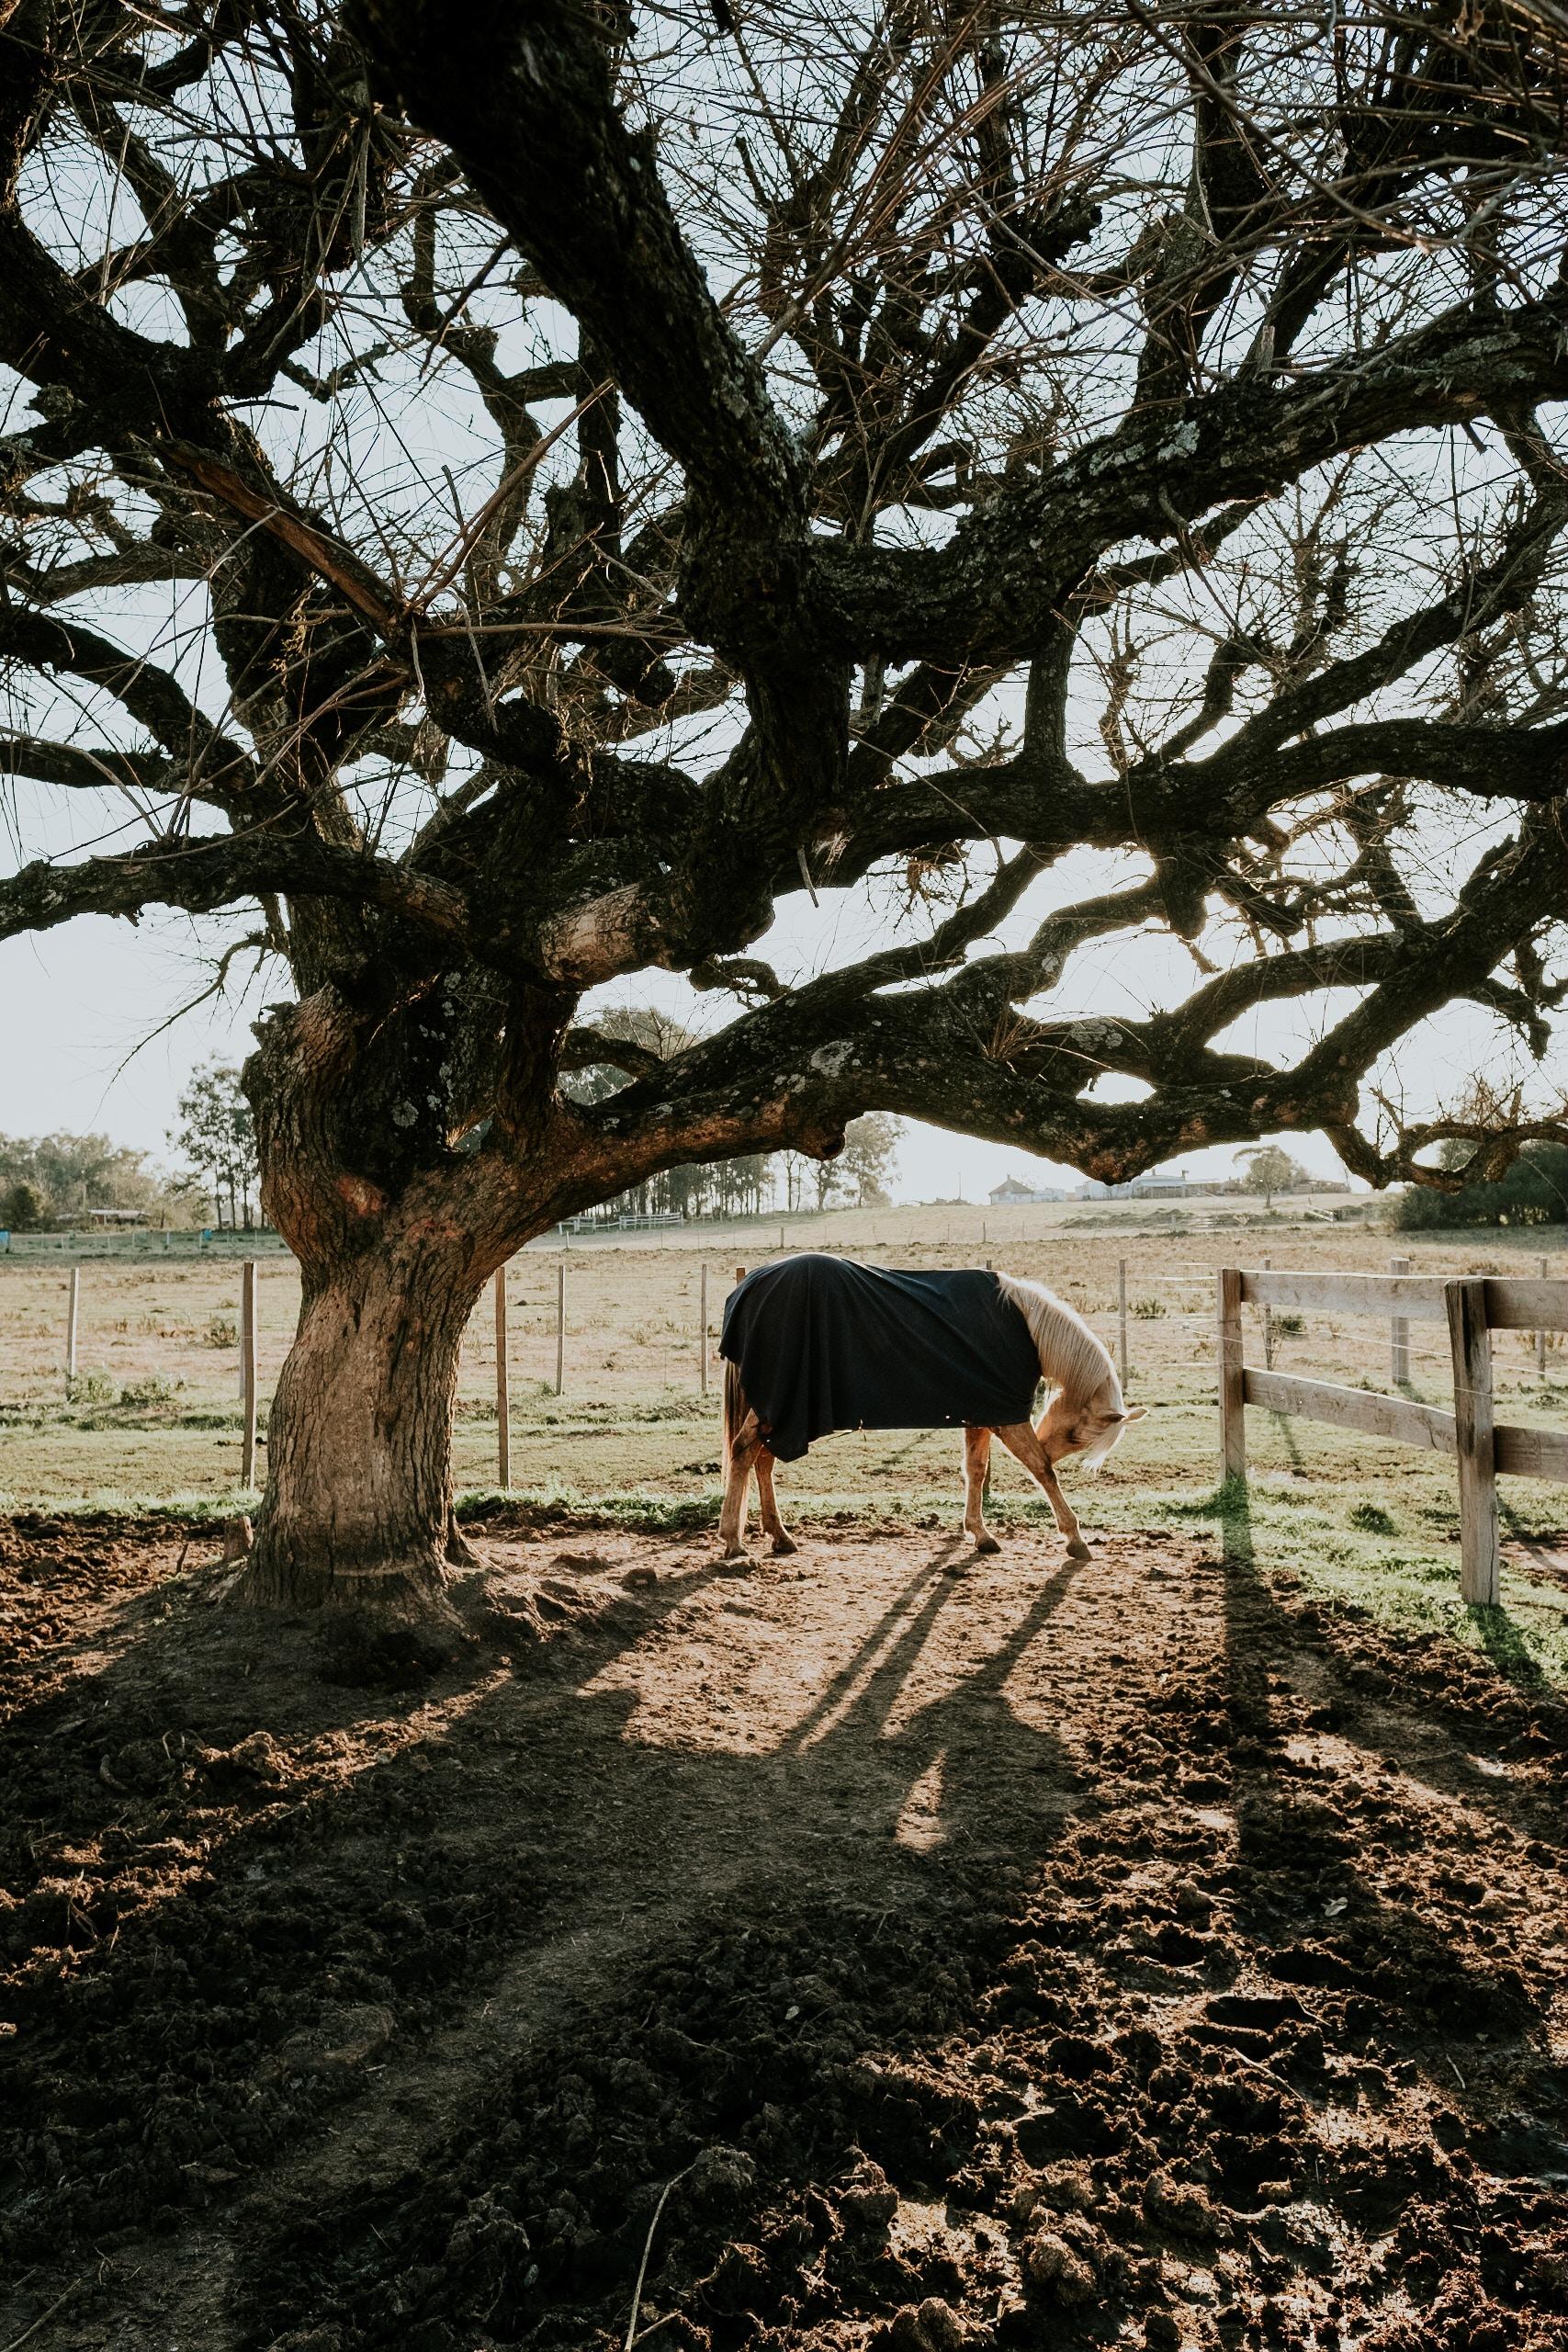 white horse beside bare tree at daytime